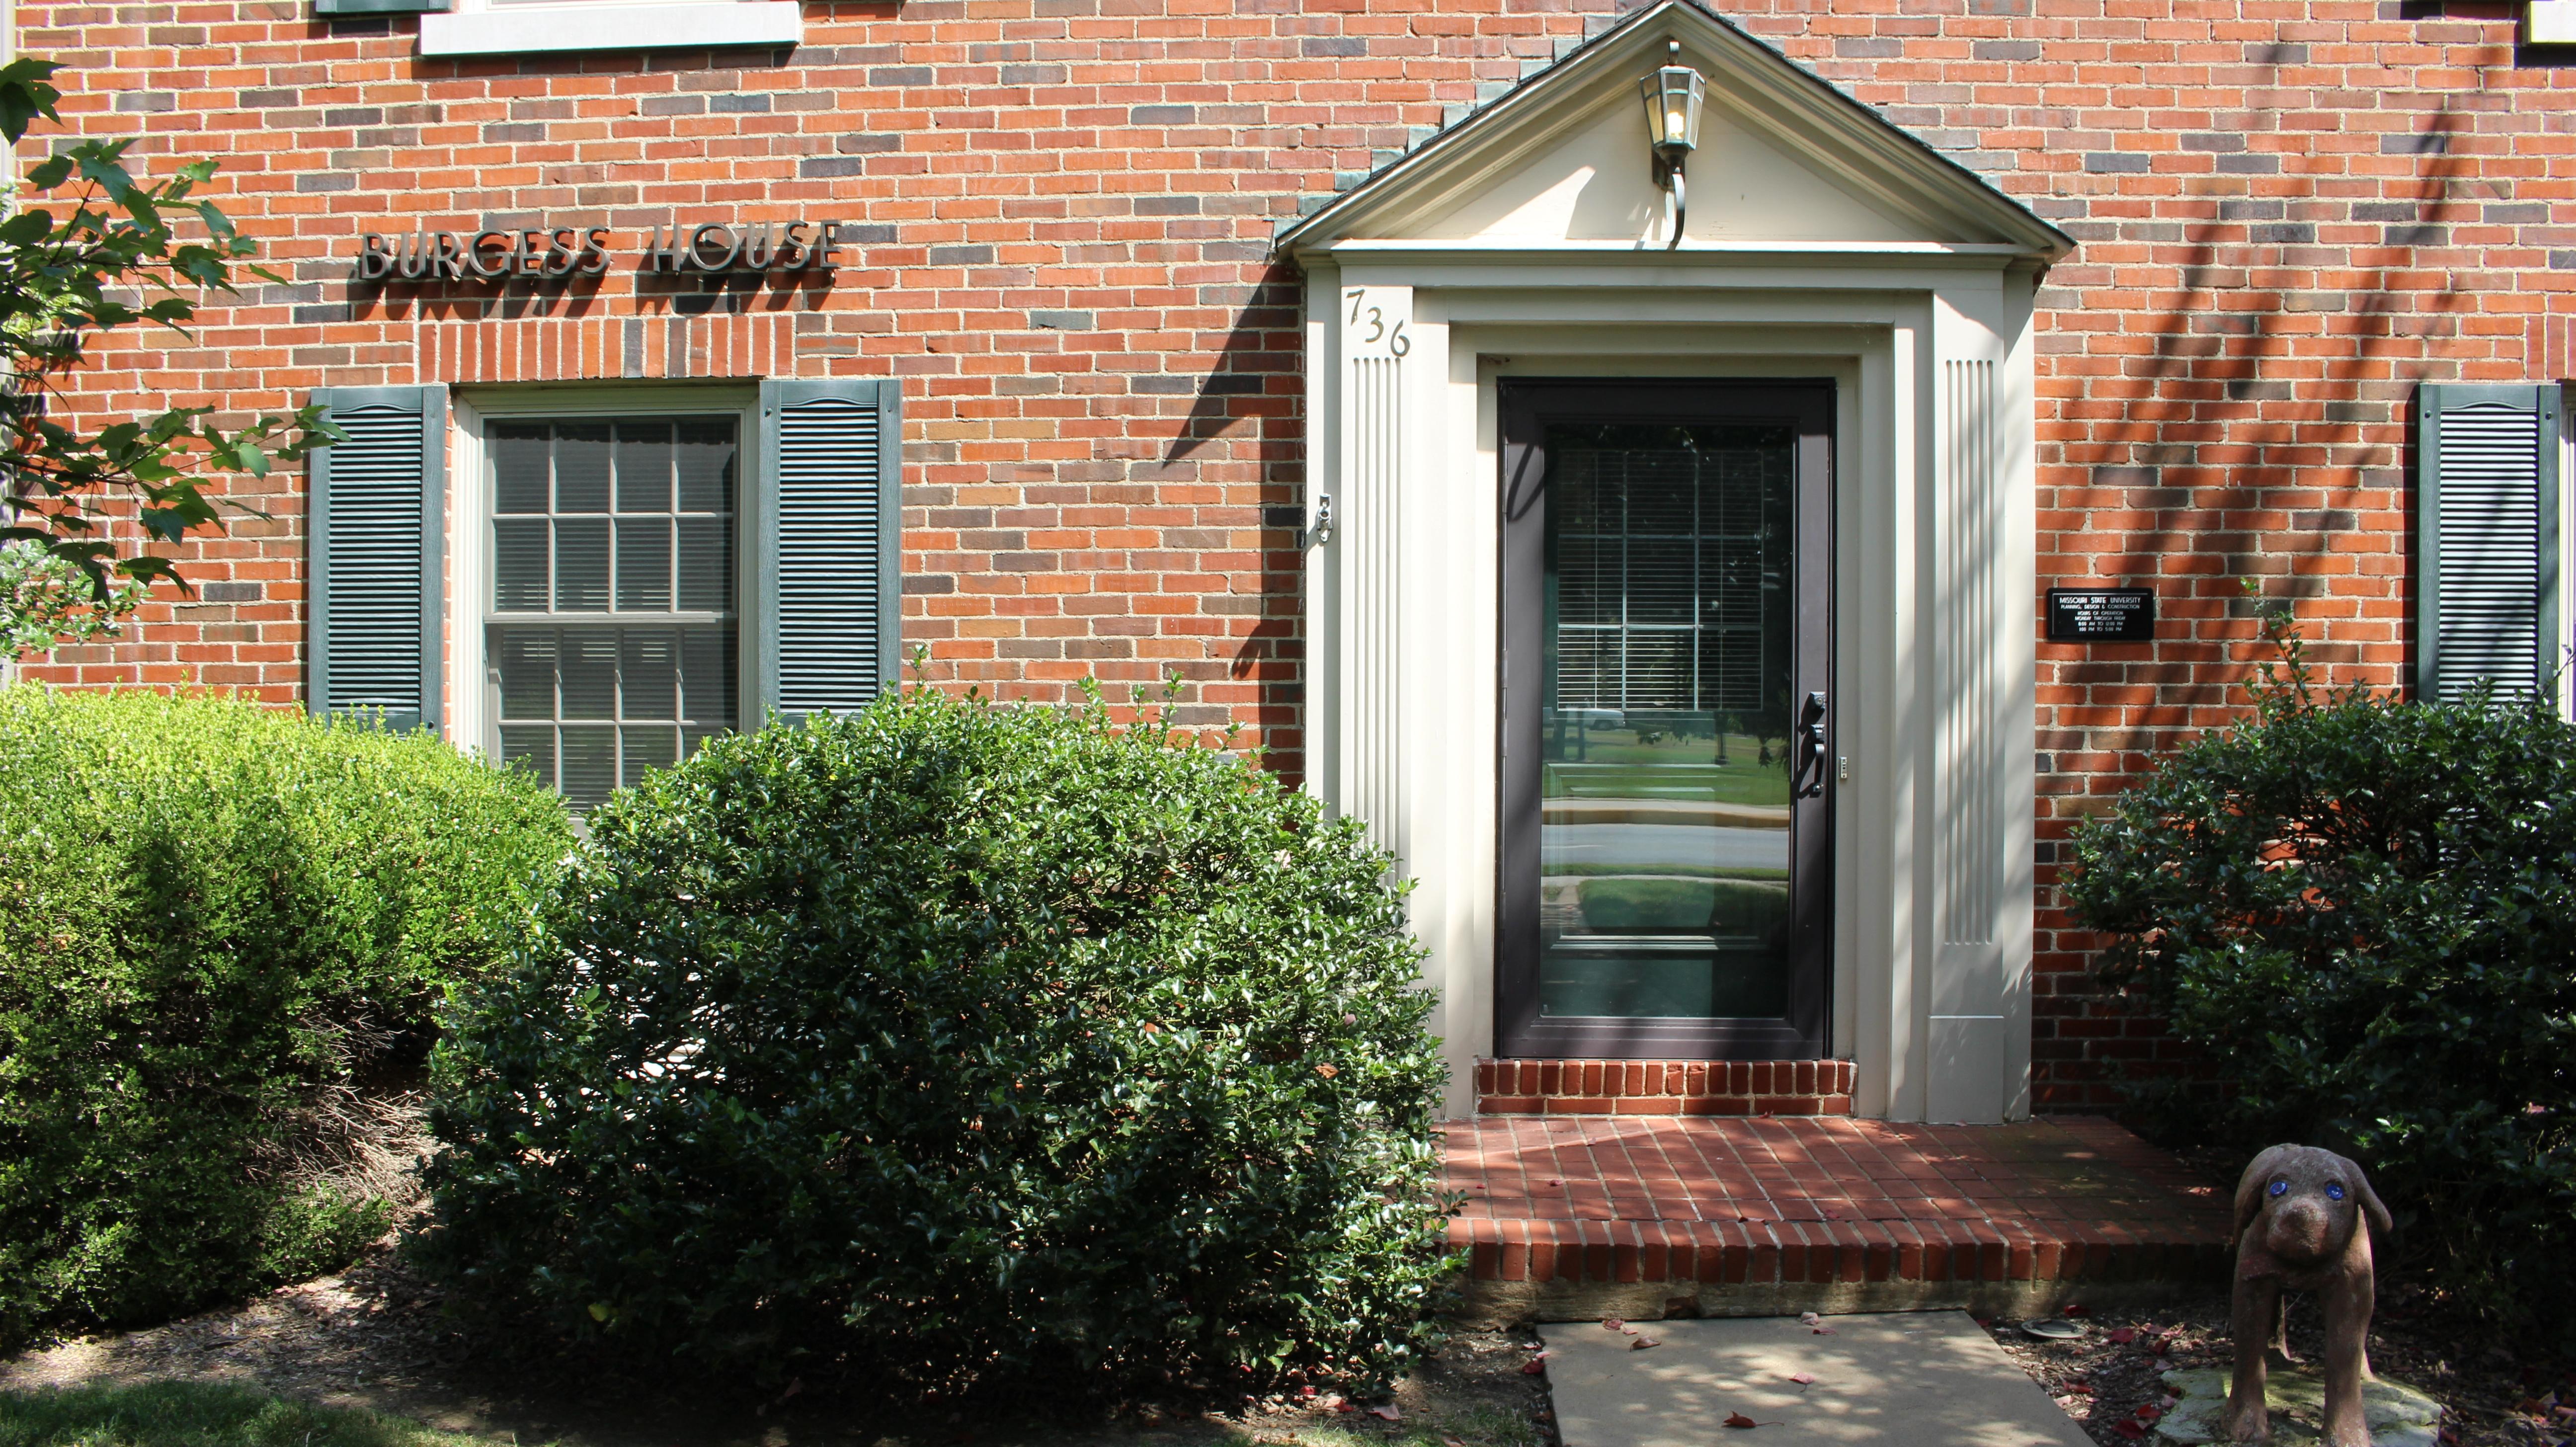 Burgess House Front Entrance